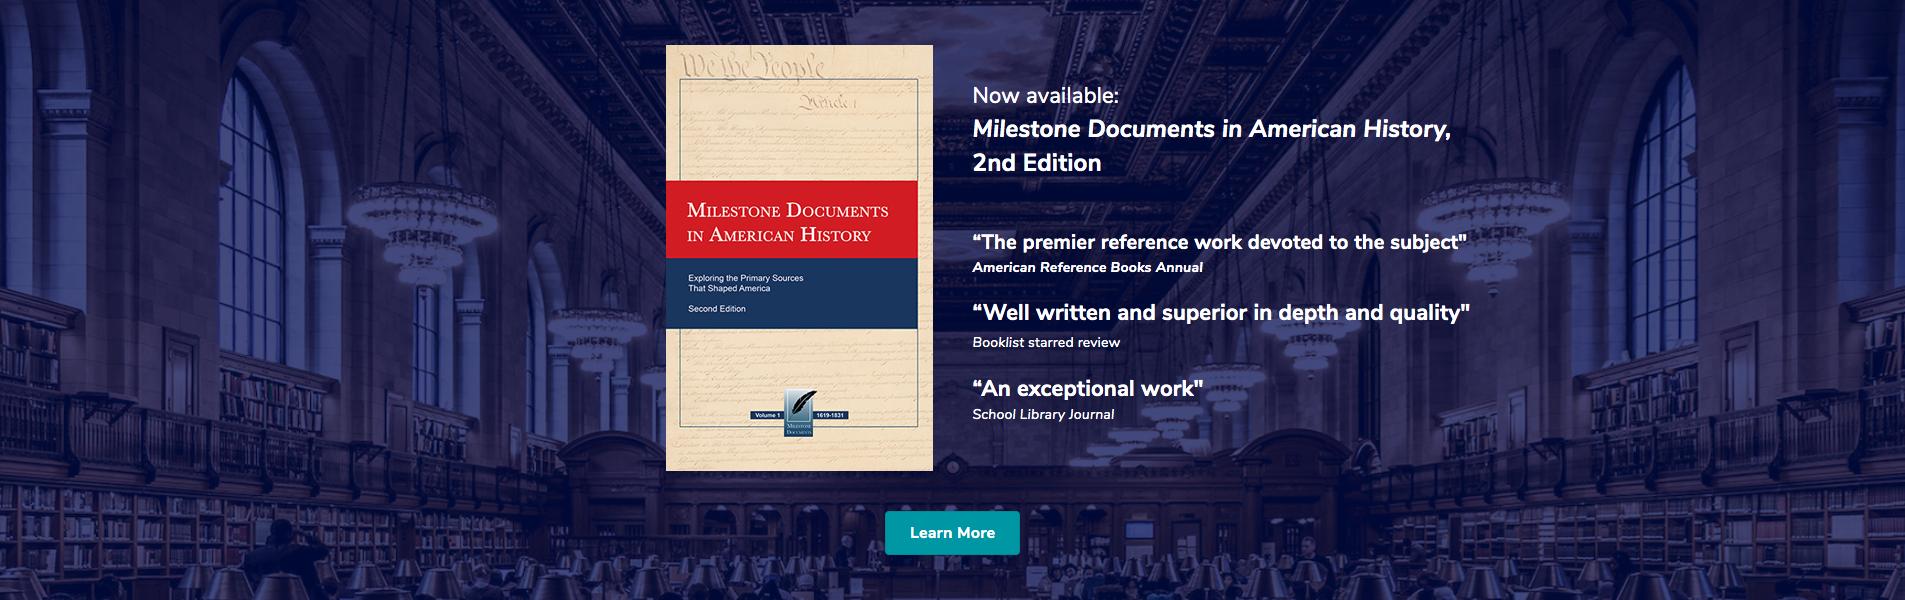 Milestone Documents in American History